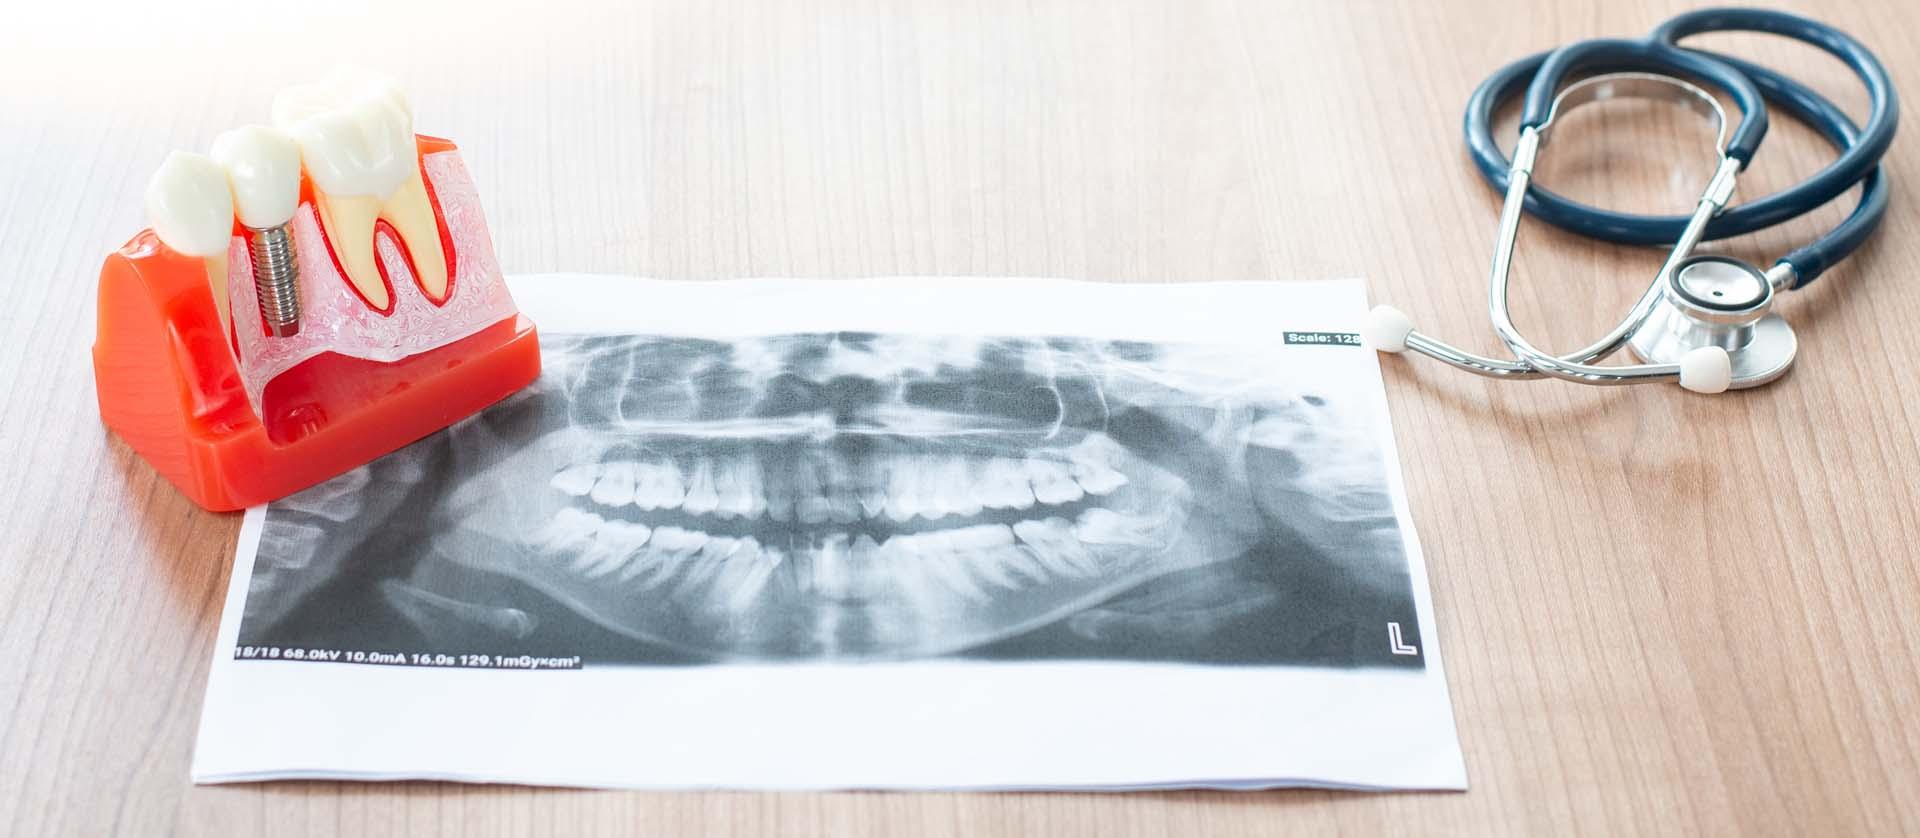 Odbacivanje zubnih implantata - razlozi i protokol